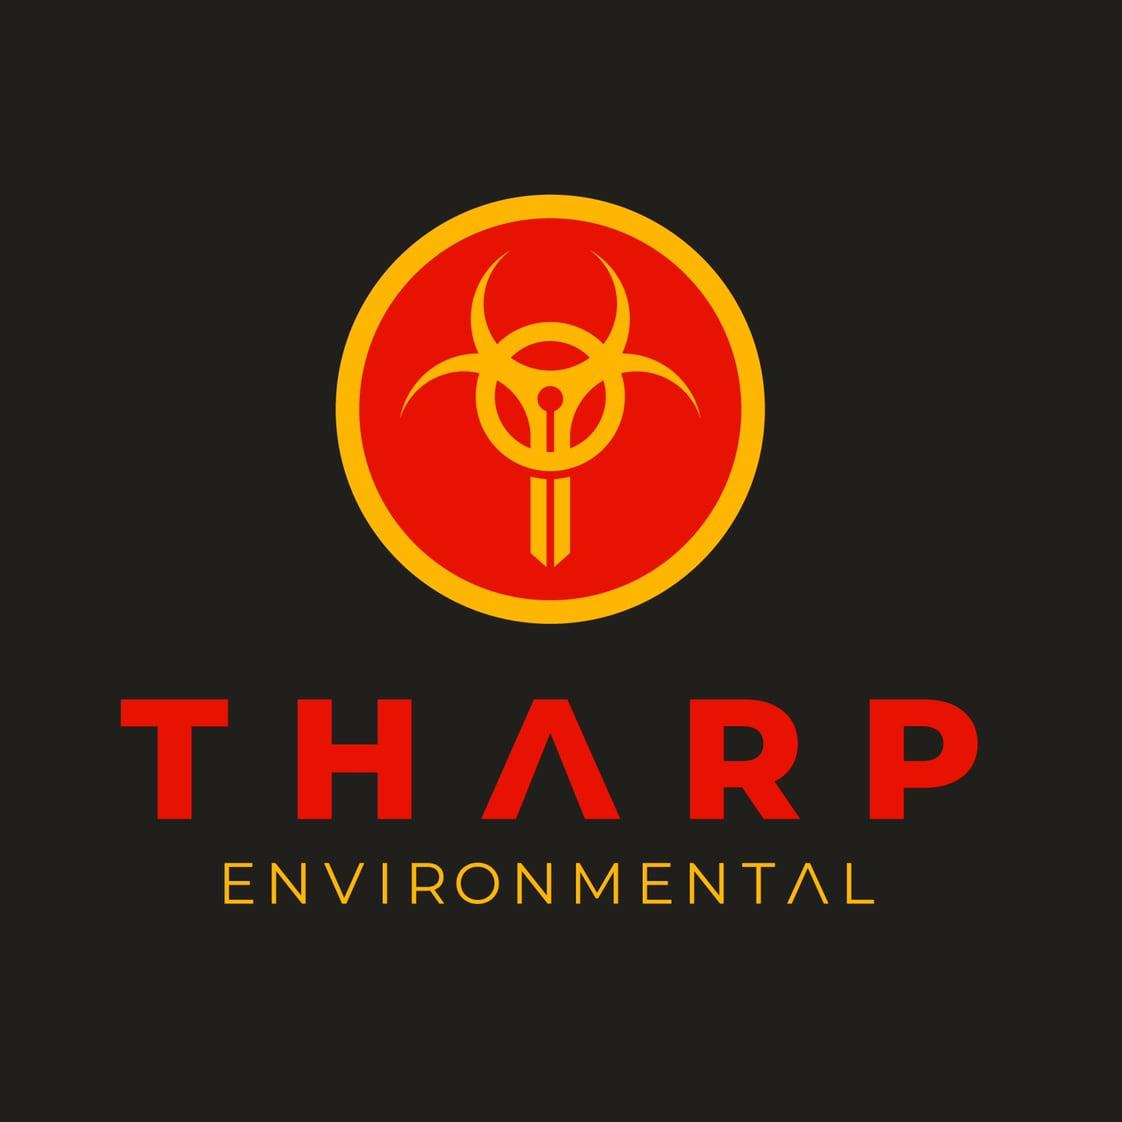 Tharp Environmental